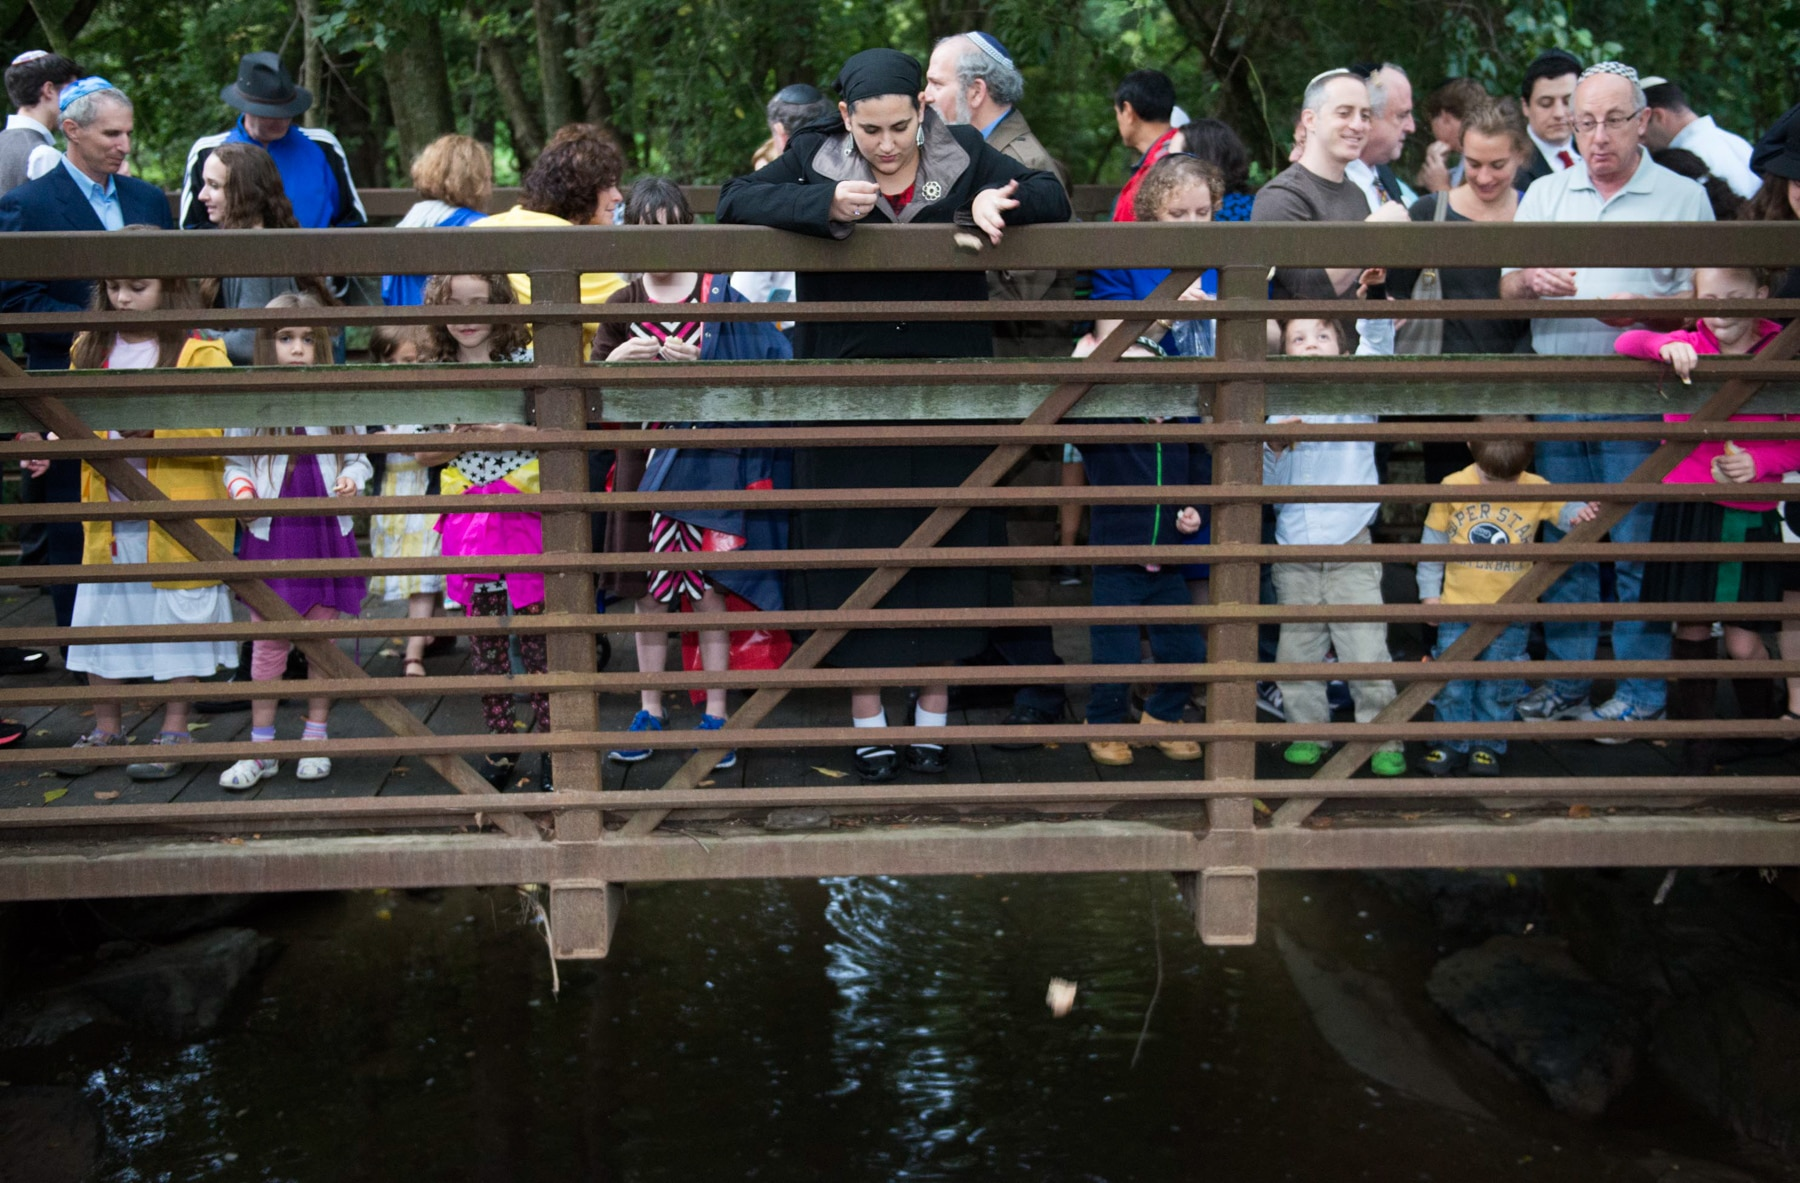 Crowd of people on a bridge dropping bread into creek below (© Linda Davidson/Washington Post via Getty Images)